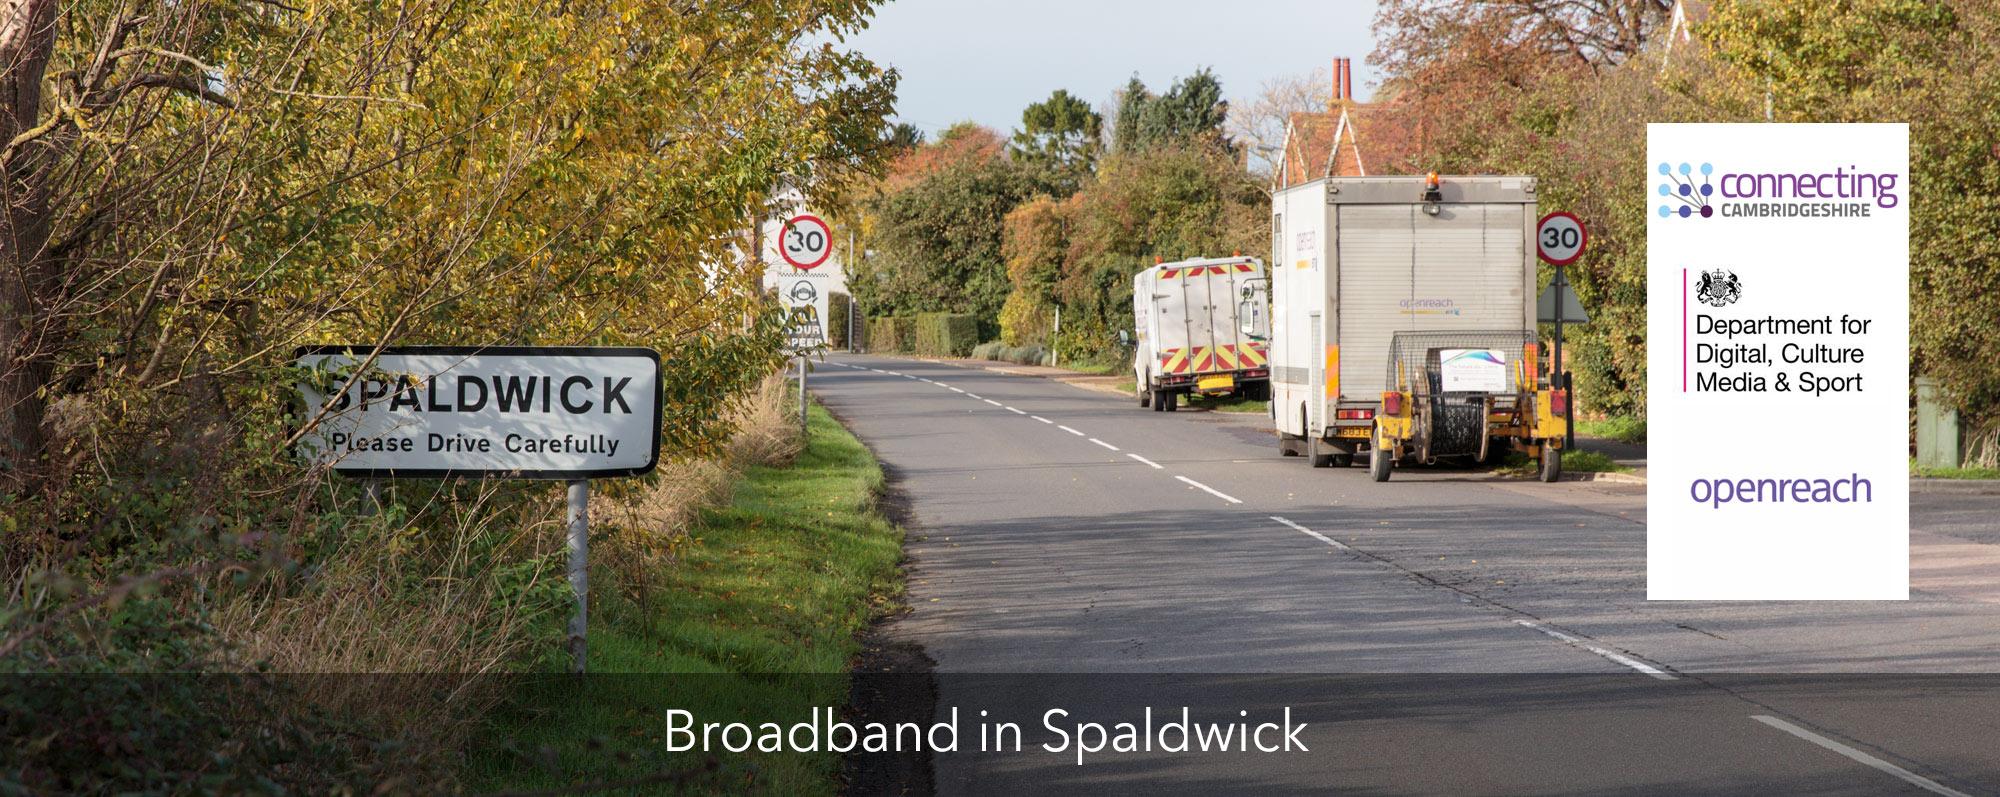 Broadband in Spaldwick